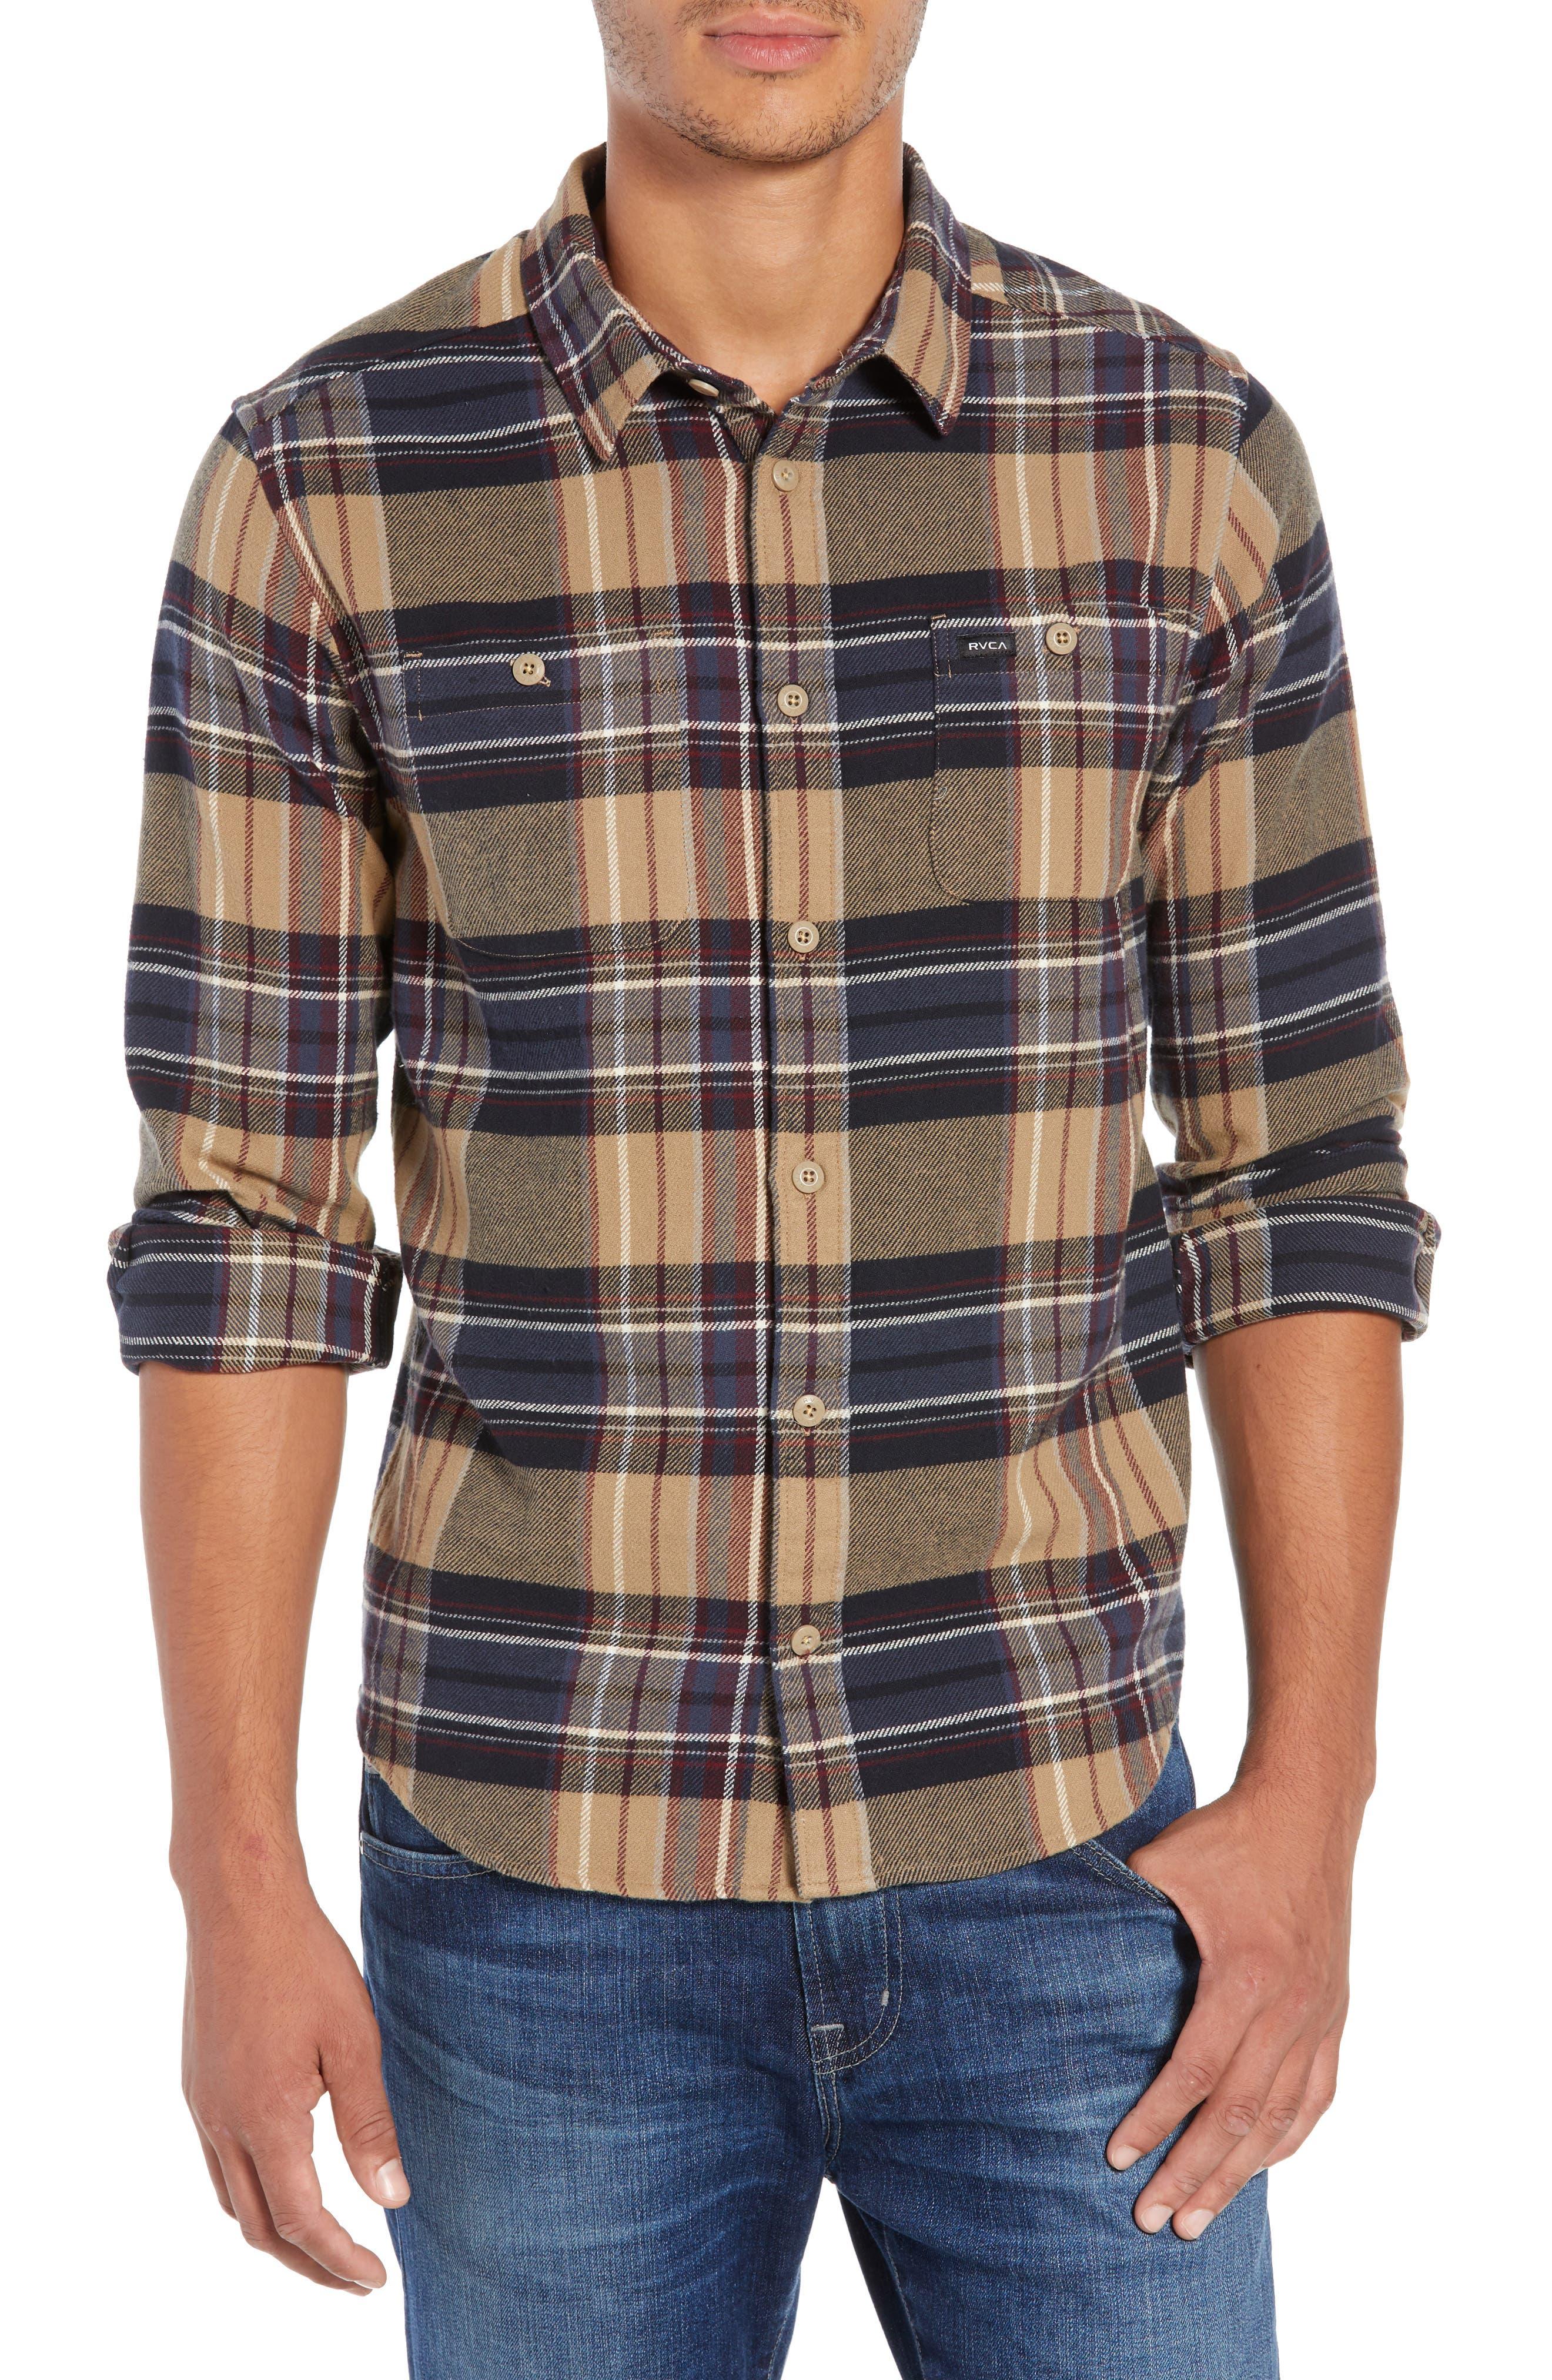 Rvca Ludlow Plaid Flannel Shirt, Brown